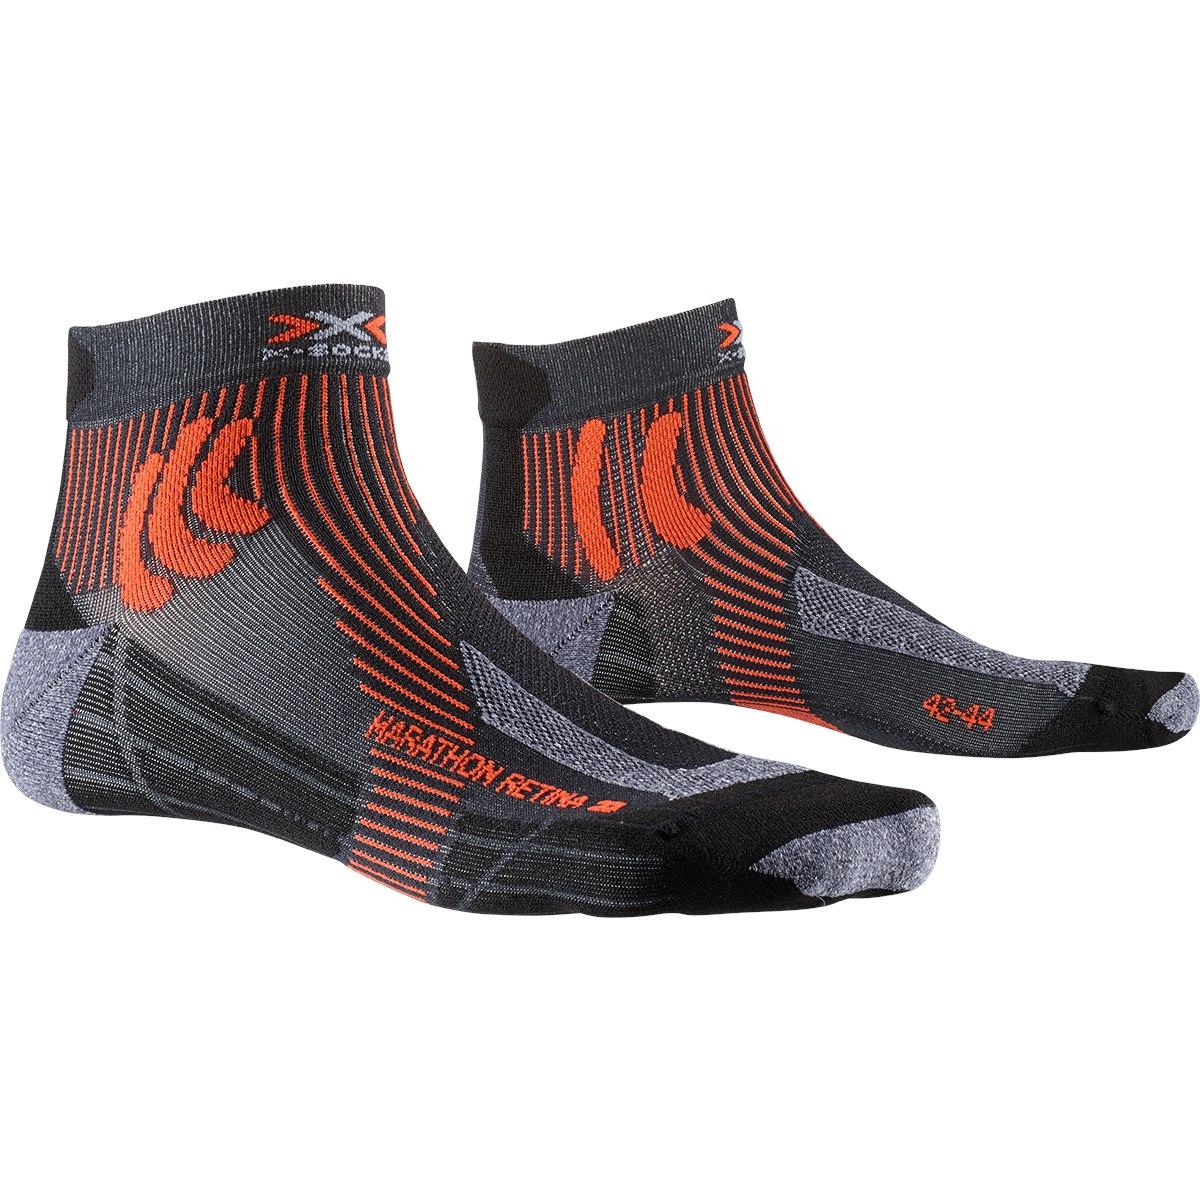 X-Socks Marathon Retina 4.0 Laufsocken - stone grey melange/x-orange